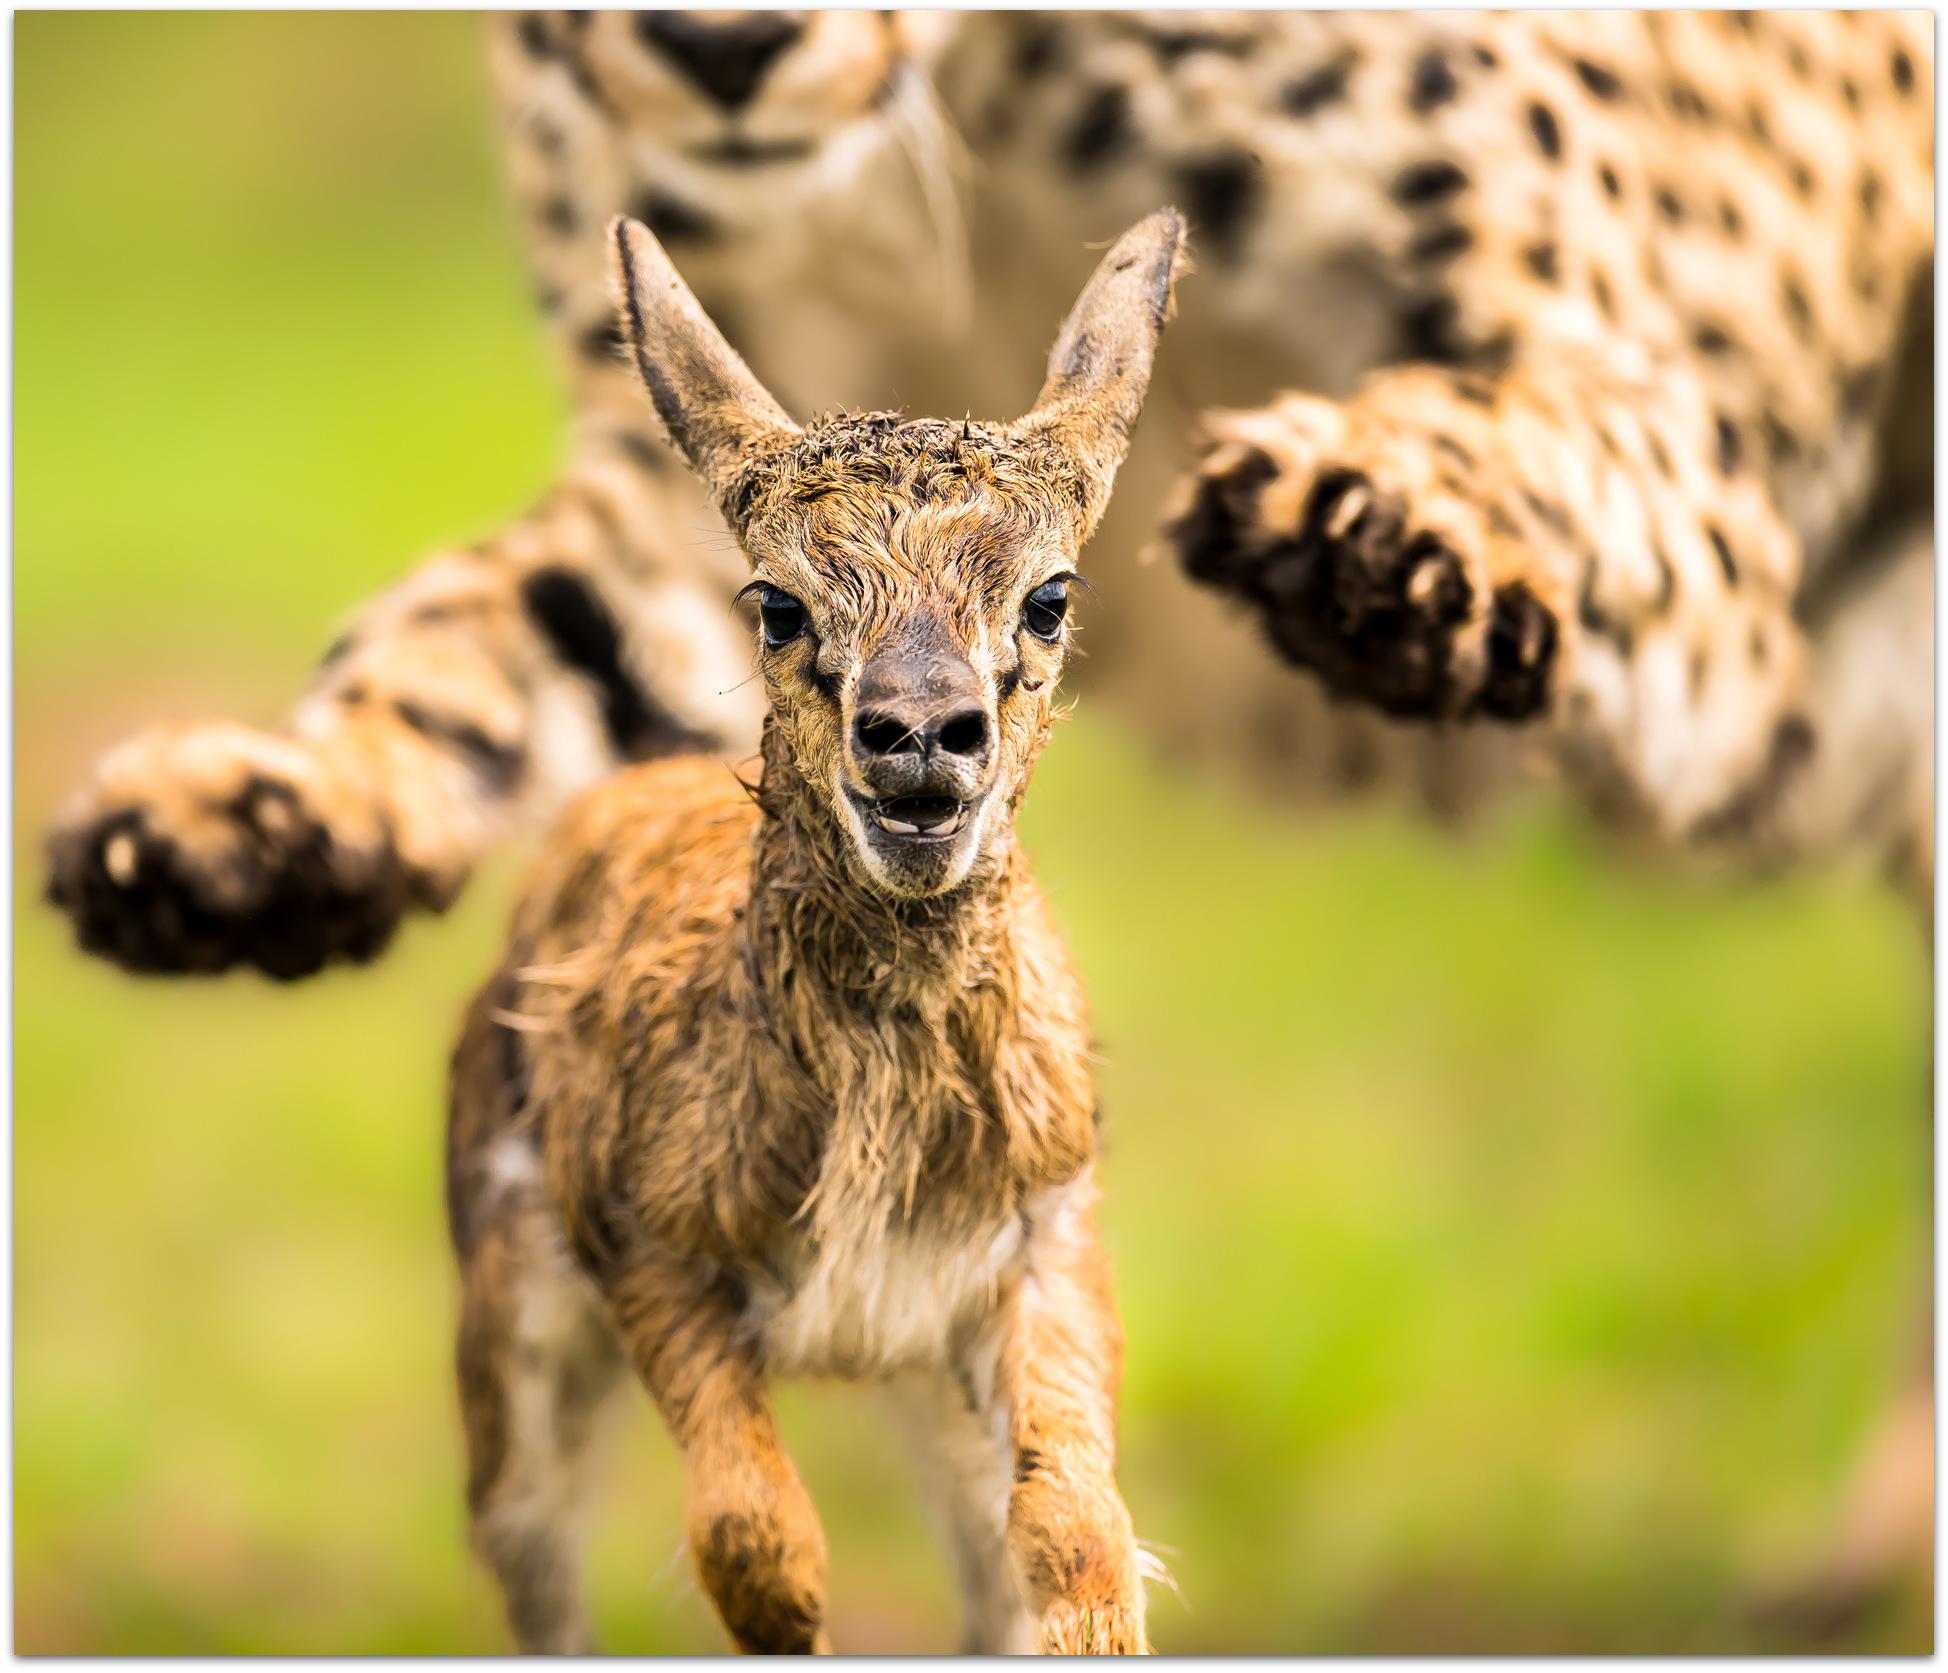 Gazelle newborn about to be caught by a cheetah in the Maasai Mara